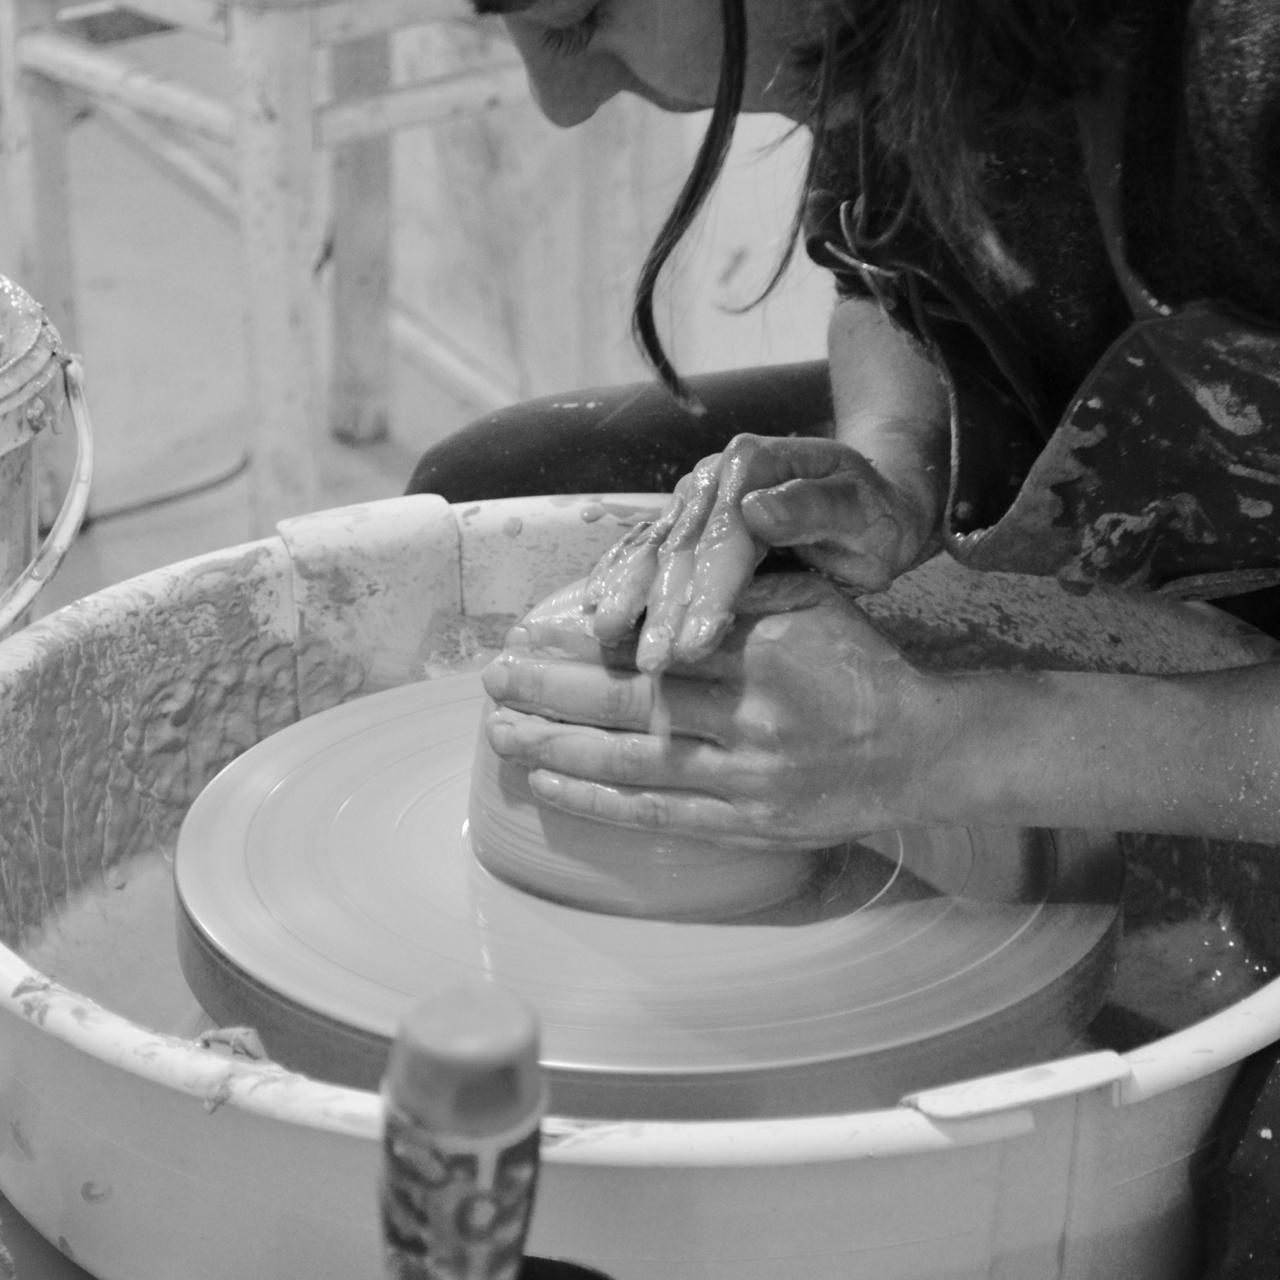 cours-stages-tournage-ceramique-bourgogne-dijon-cote-d'or